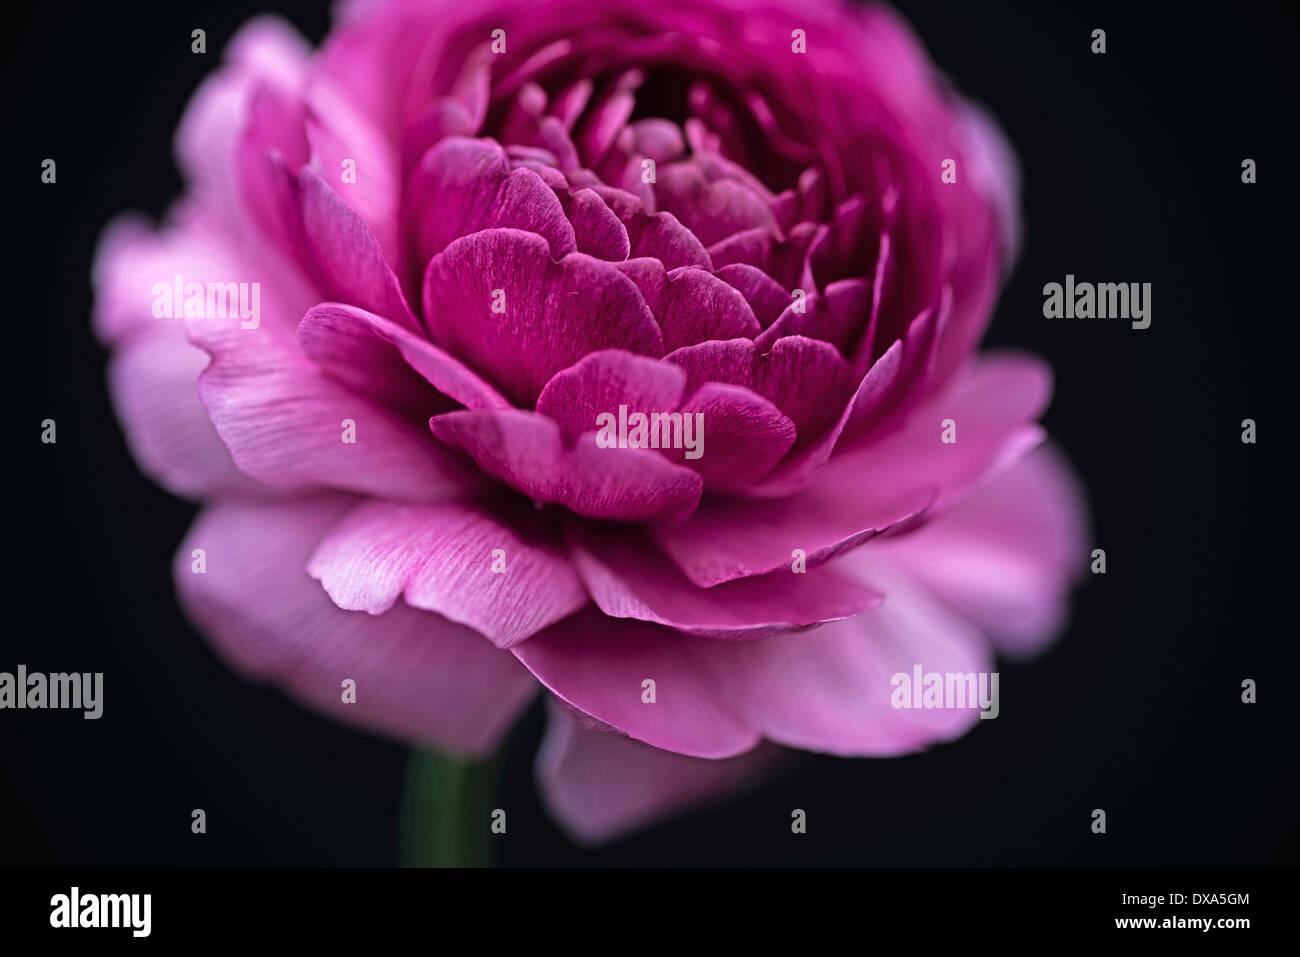 Ranucuclus persian buttercup a ranunculus asiaticus dark pink ranucuclus persian buttercup a ranunculus asiaticus dark pink flower against a solid black background mightylinksfo